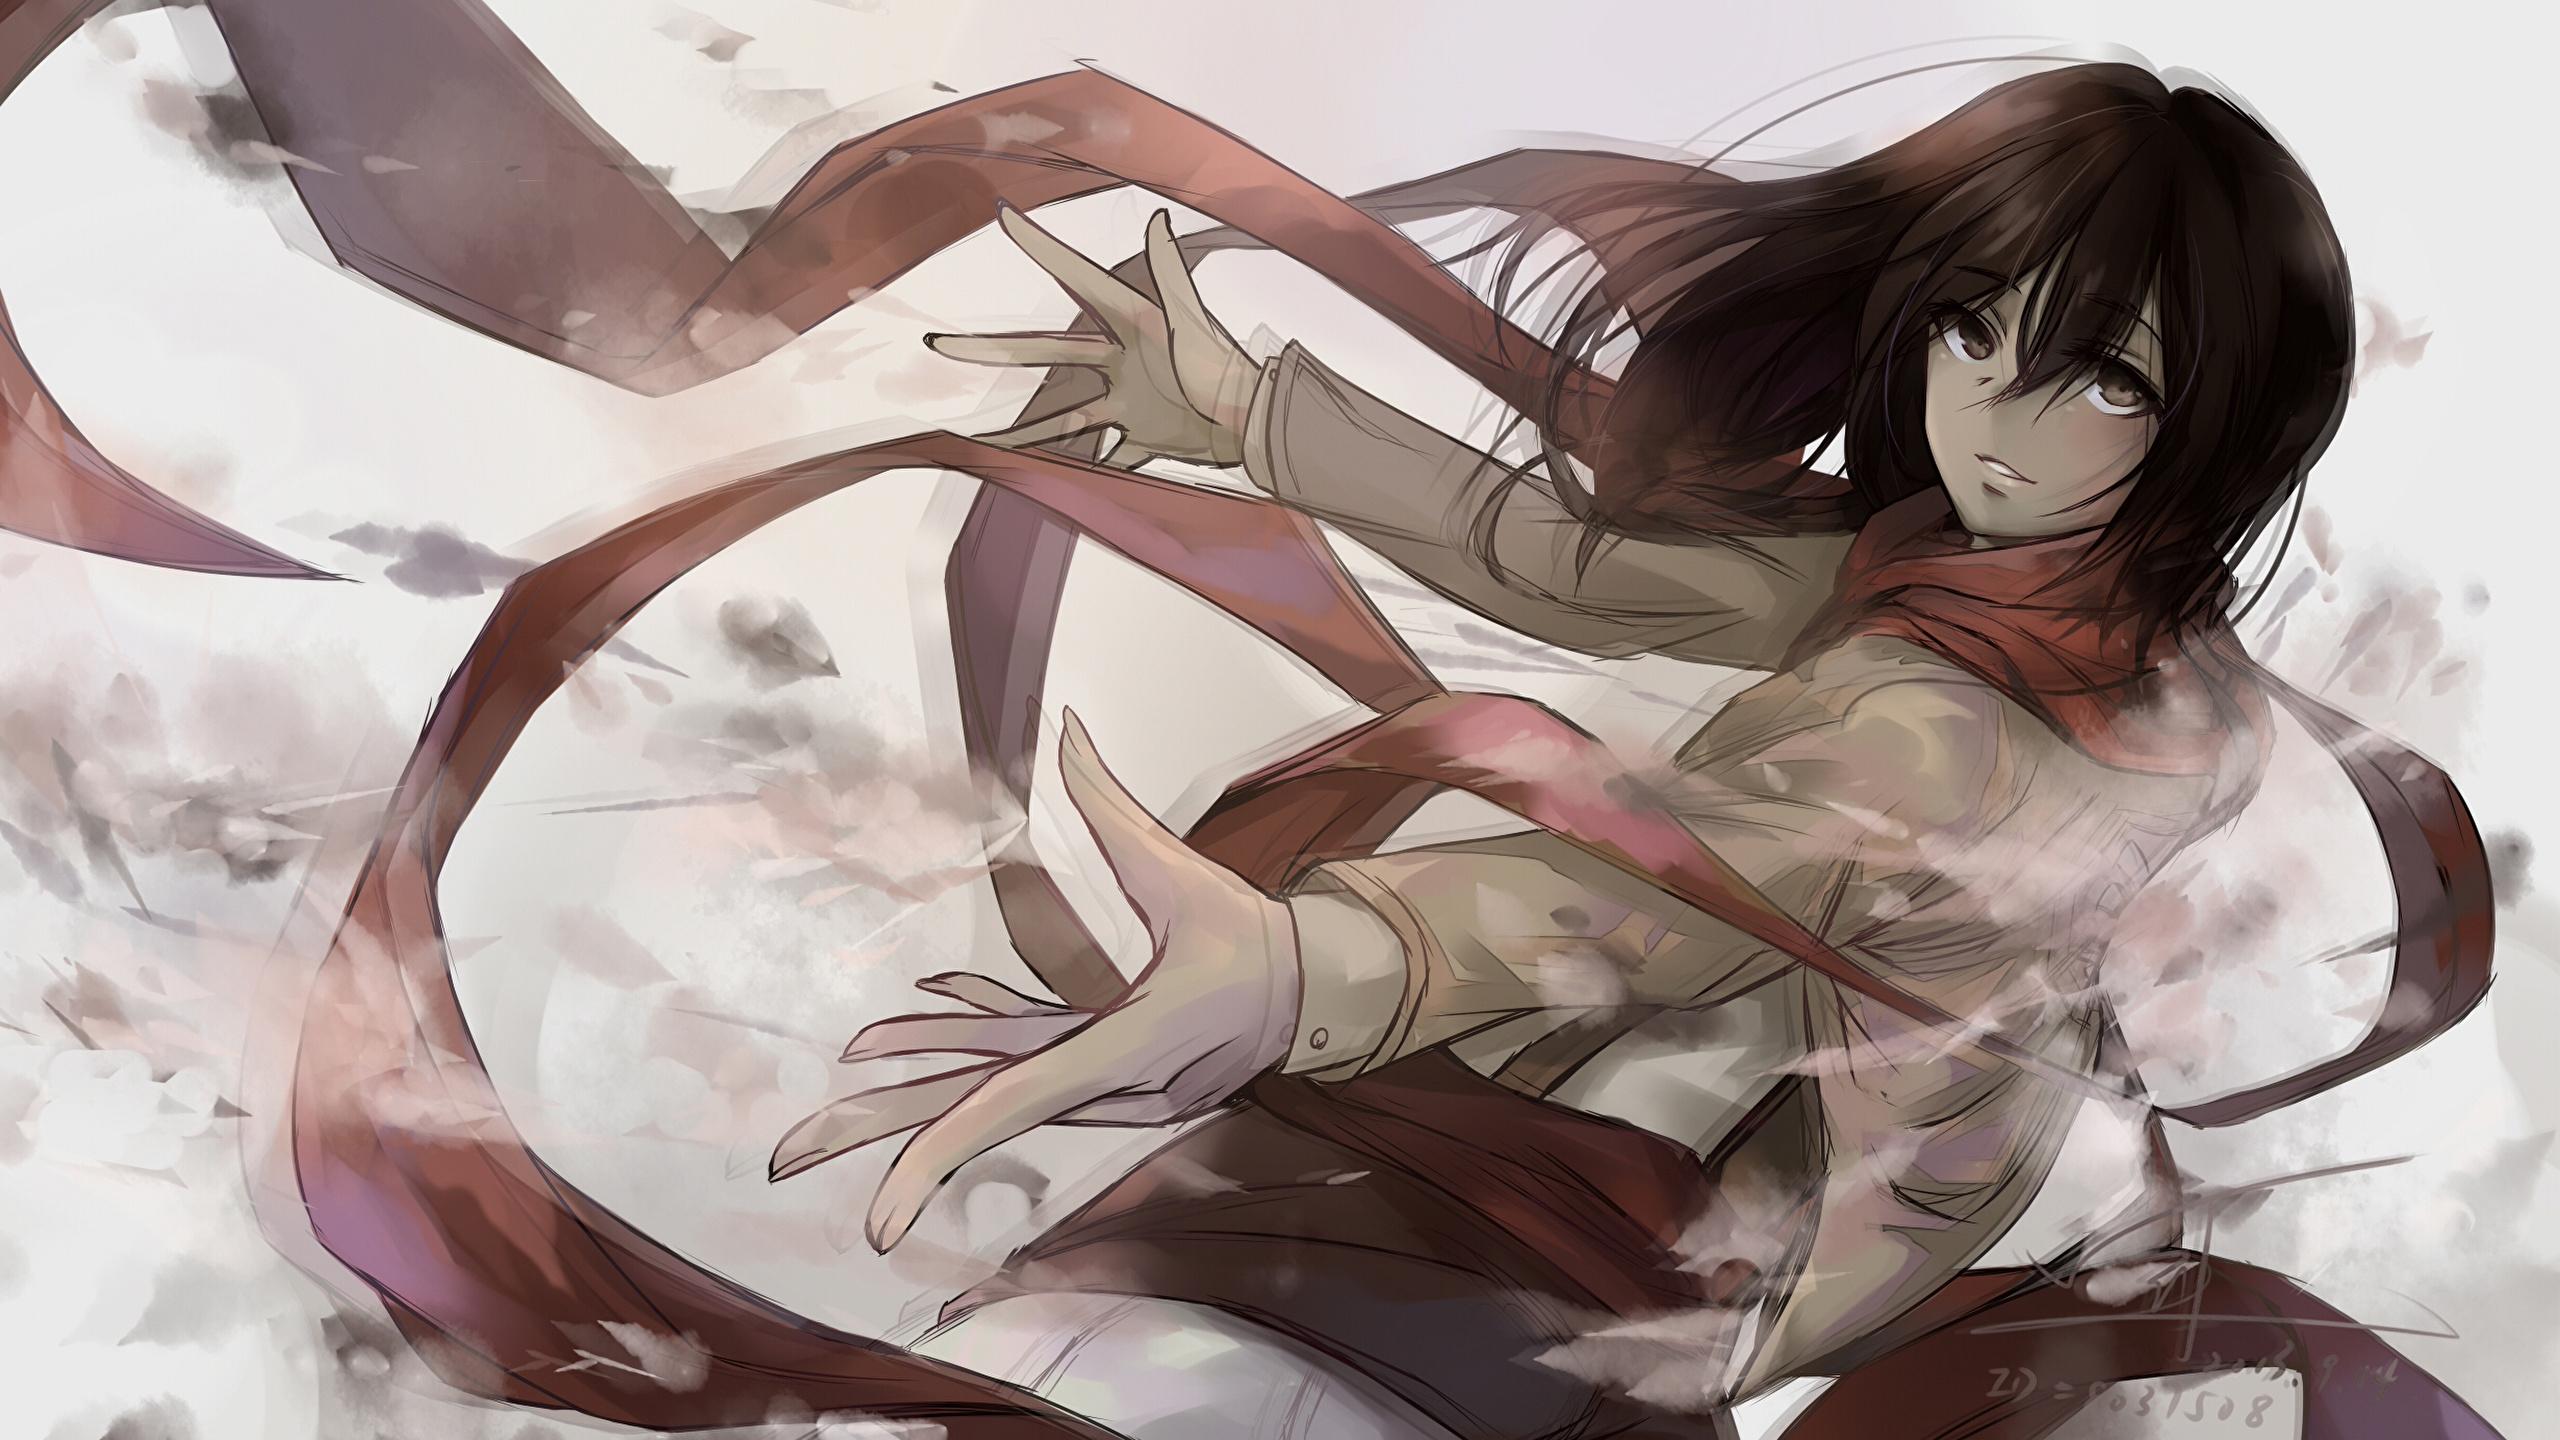 Photos Shingeki No Kyojin Mikasa Ackerman Anime Female 2560x1440